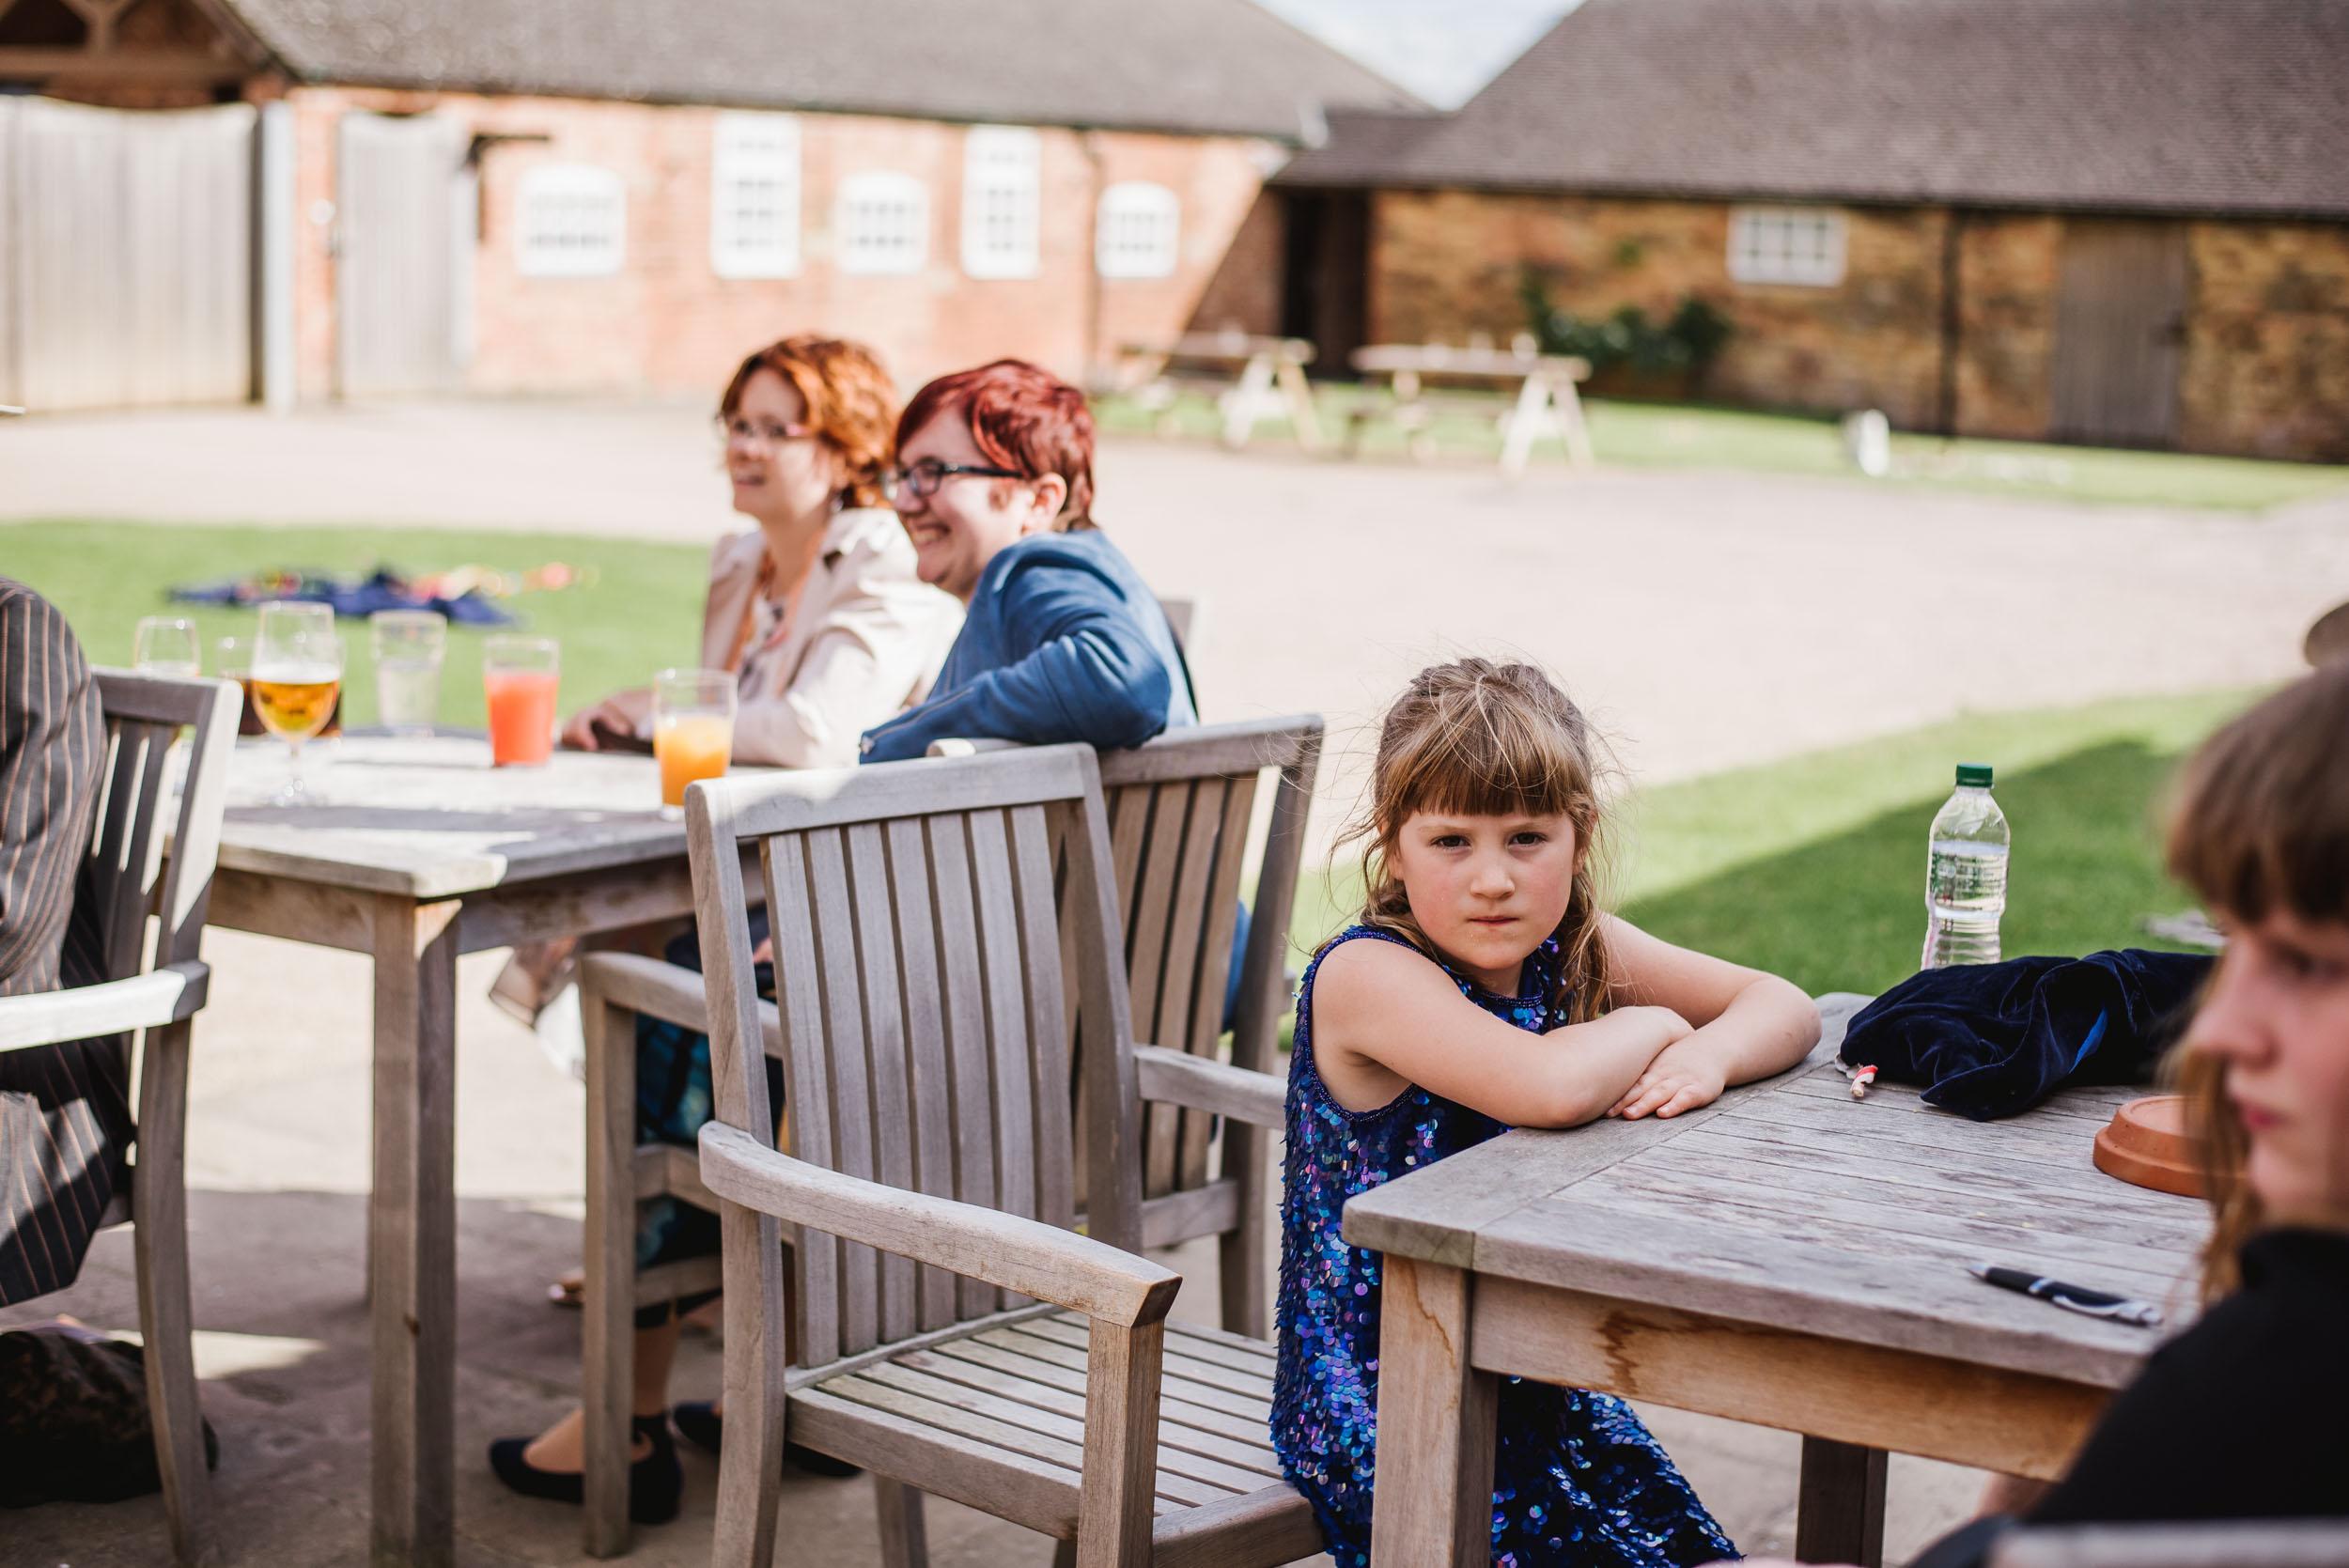 Donington-park-farm-wedding-photography-410.jpg